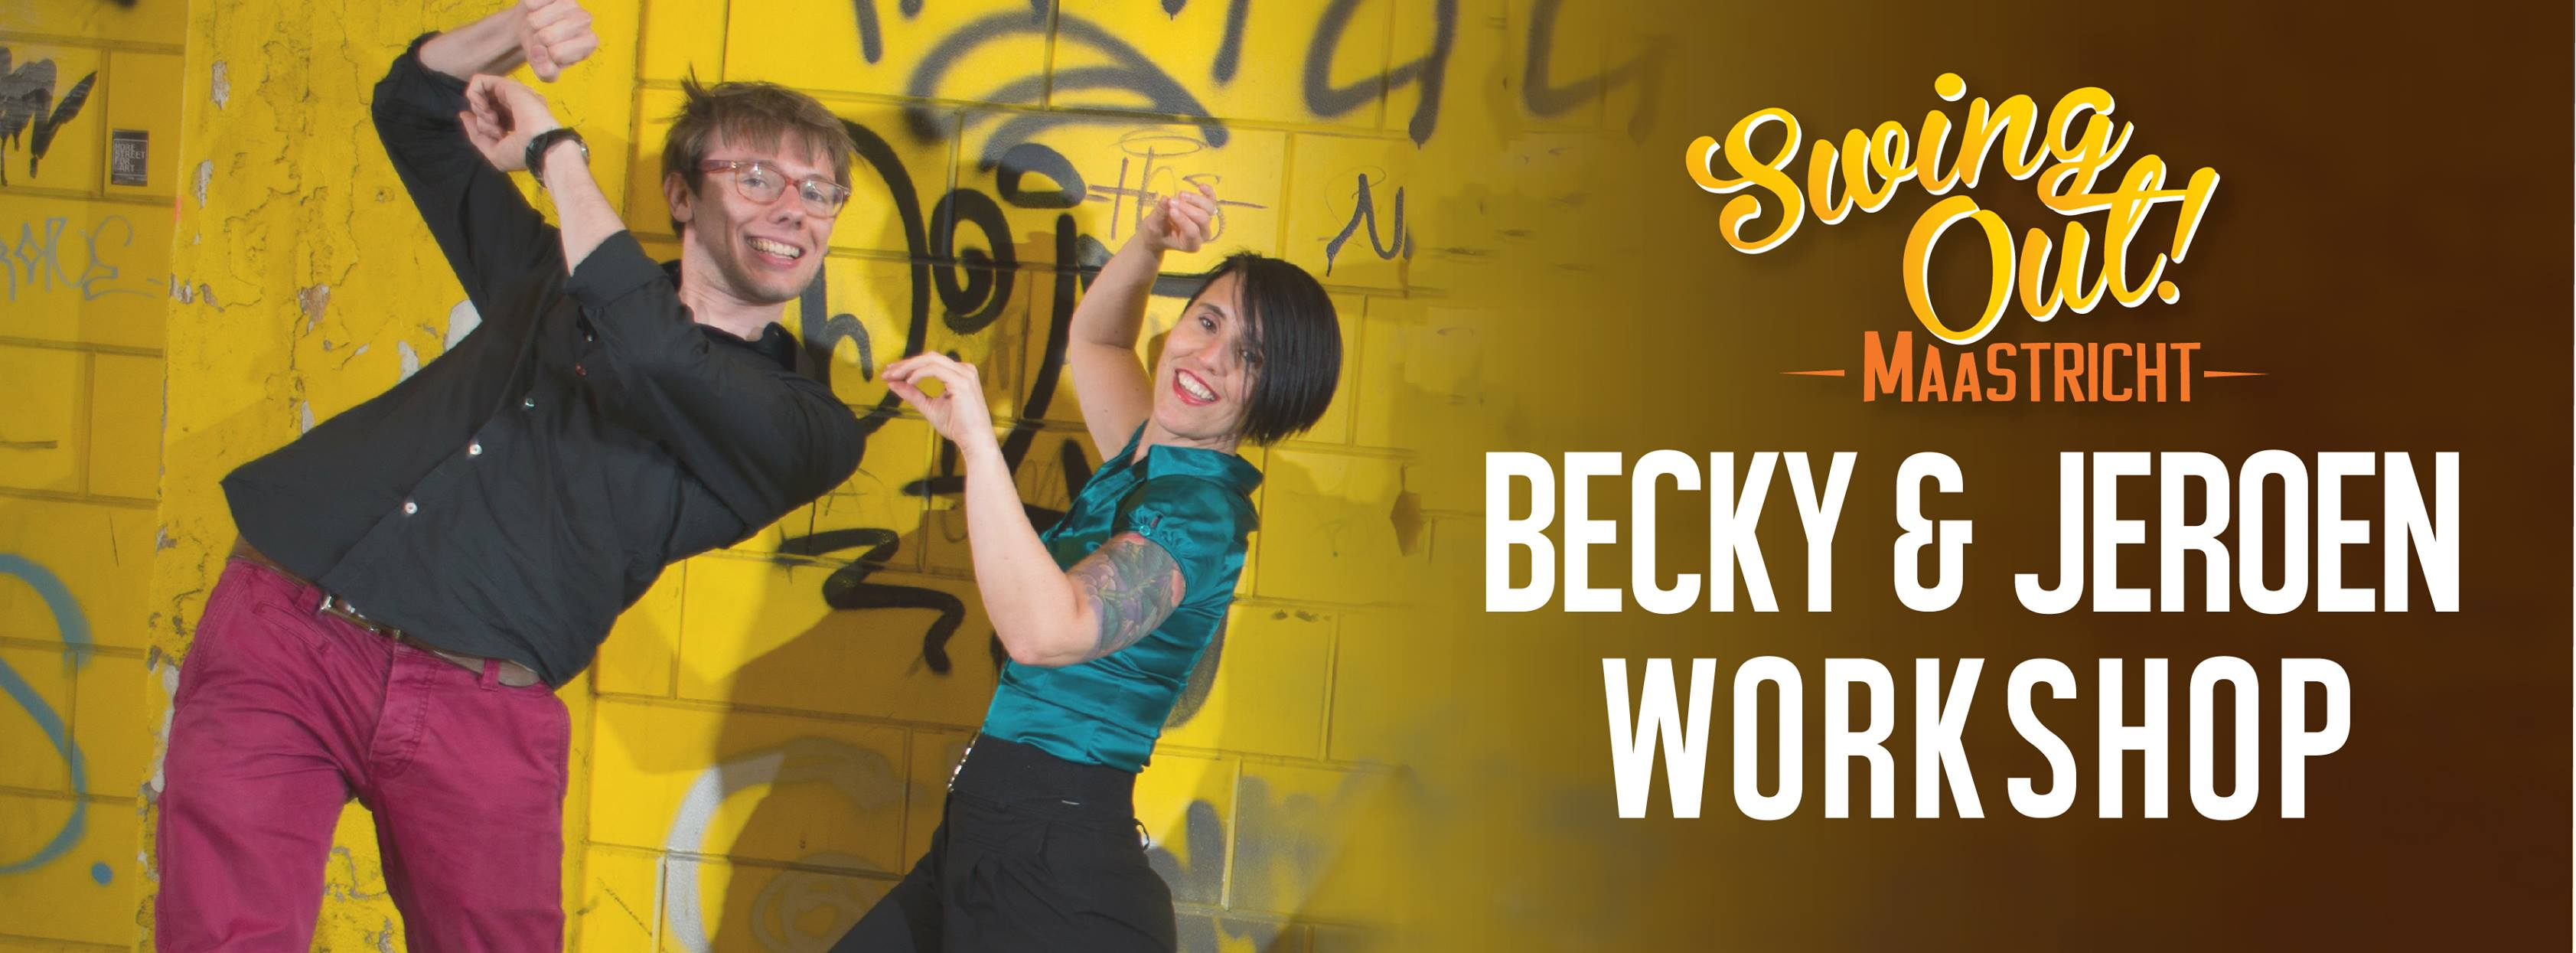 becky-jeroen-workshop-header